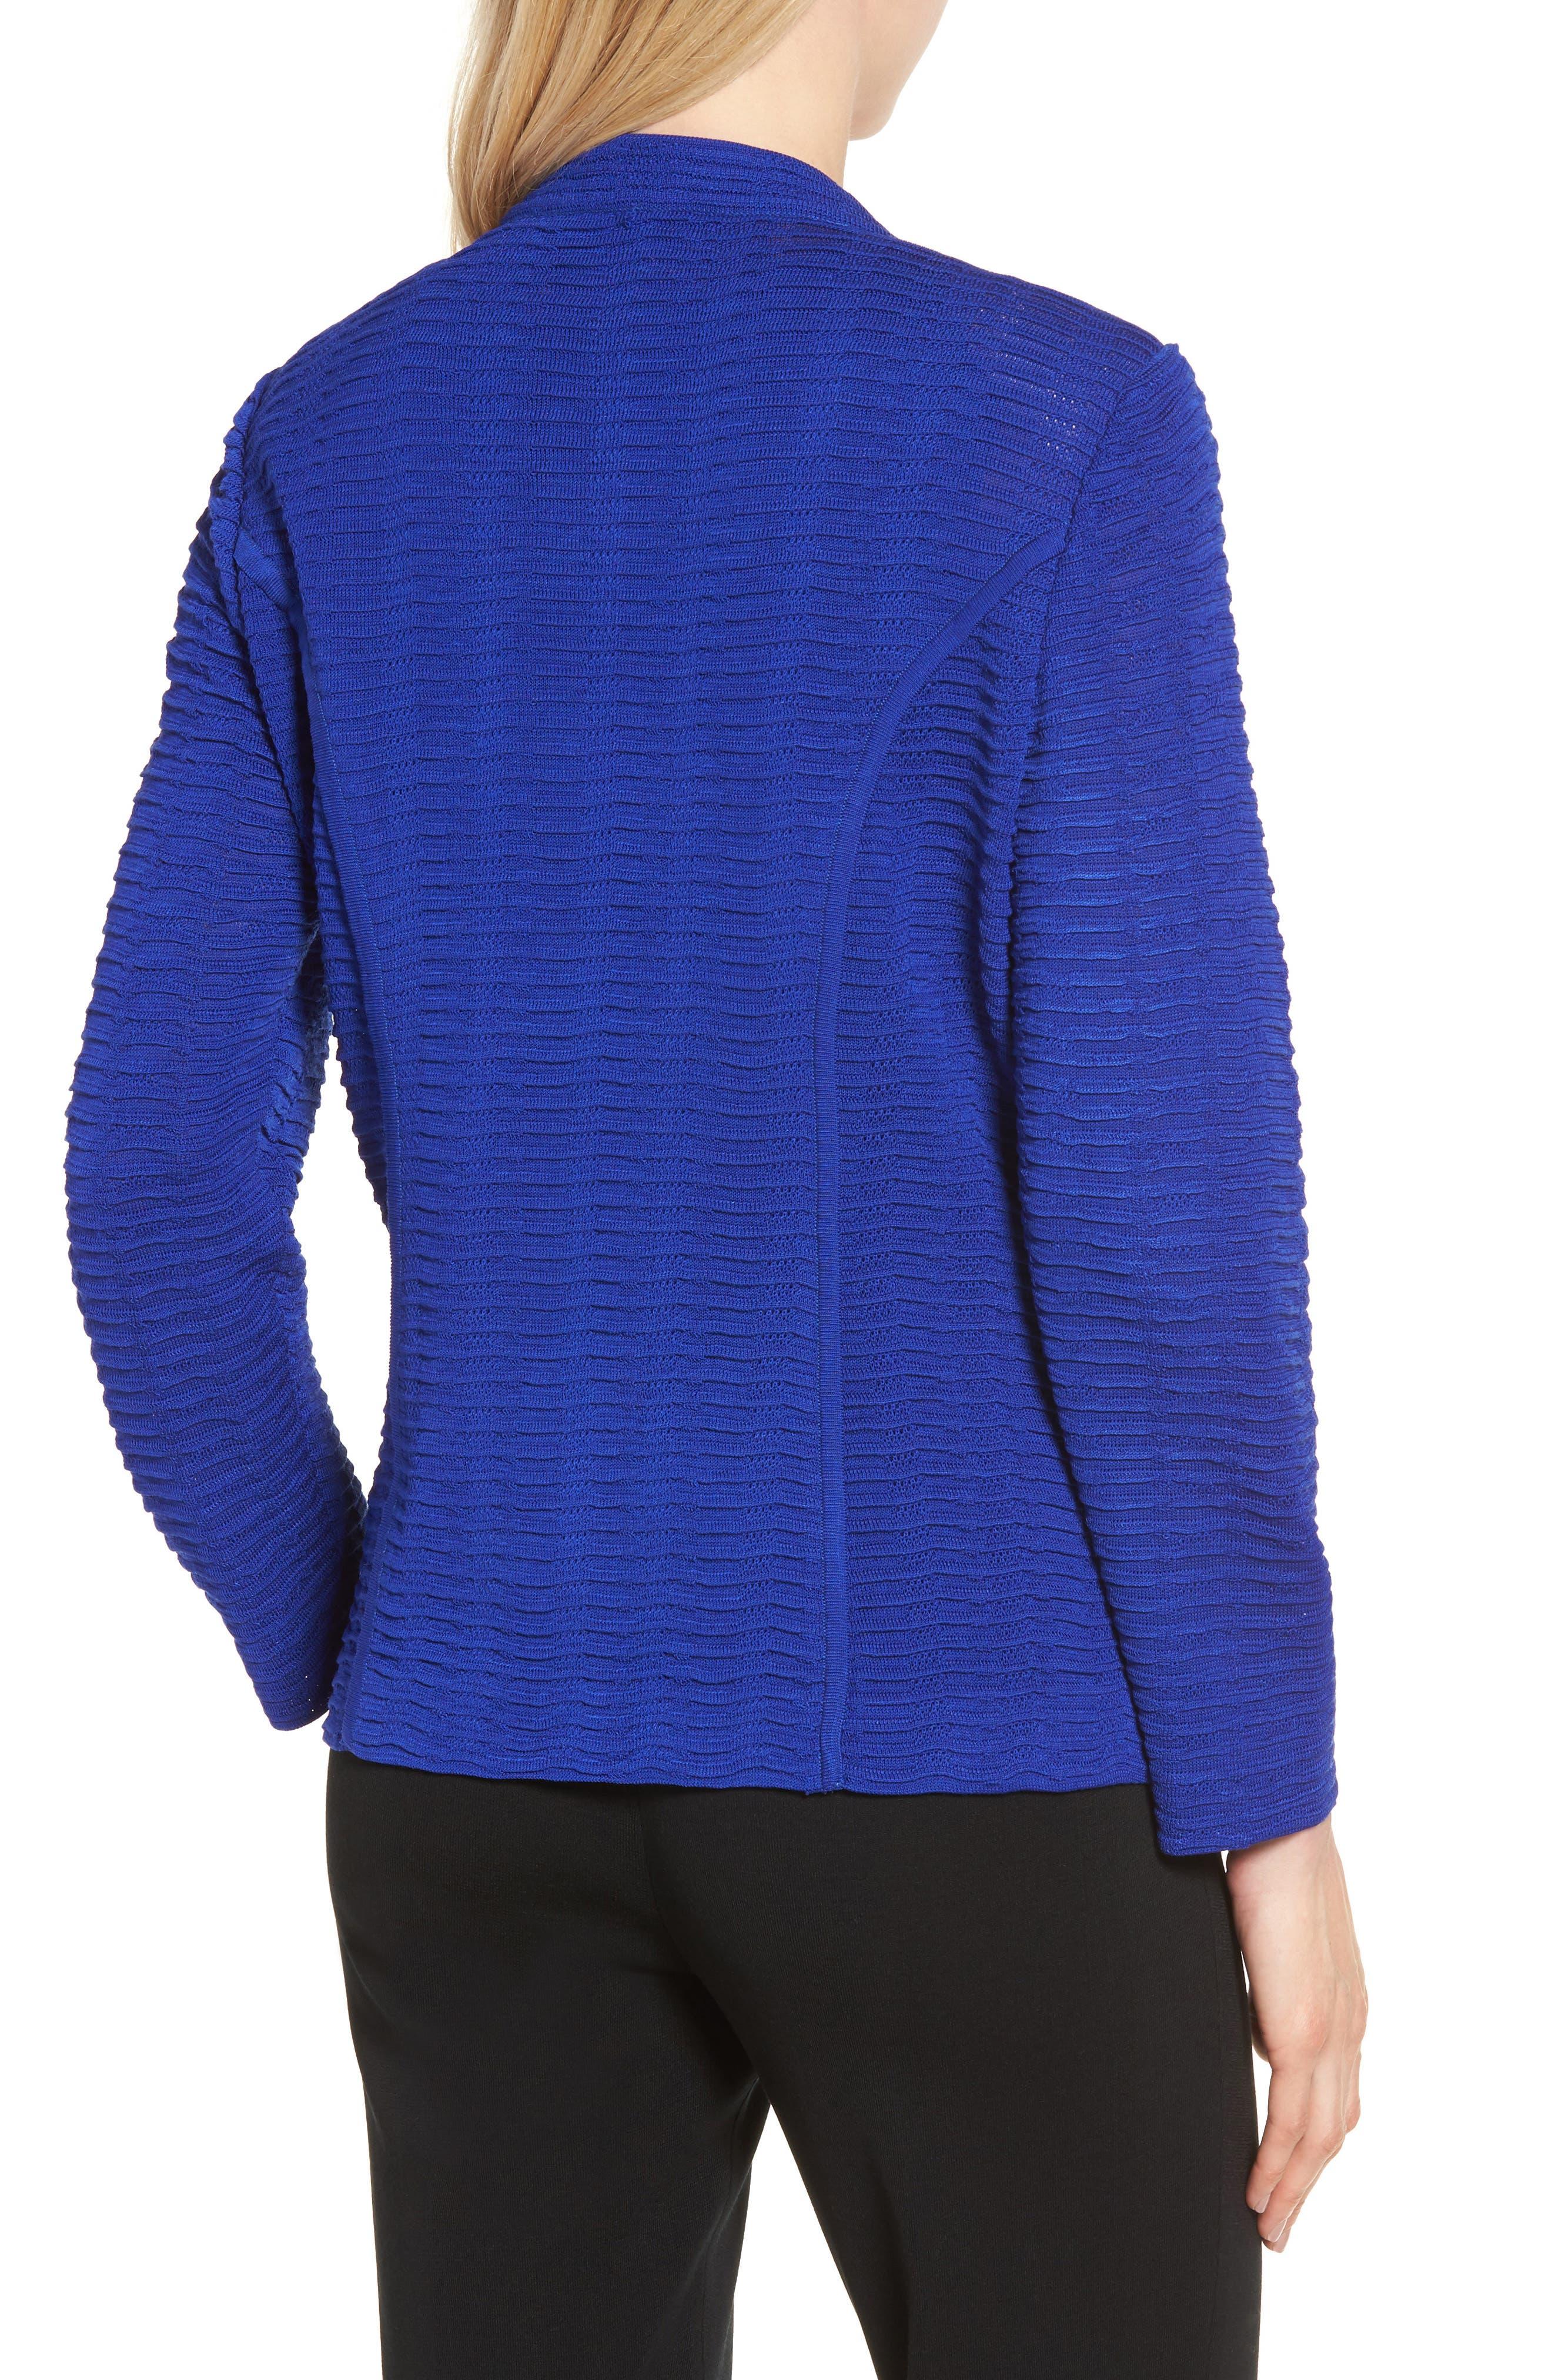 Ripple Knit Jacket,                             Alternate thumbnail 2, color,                             Blue Flame